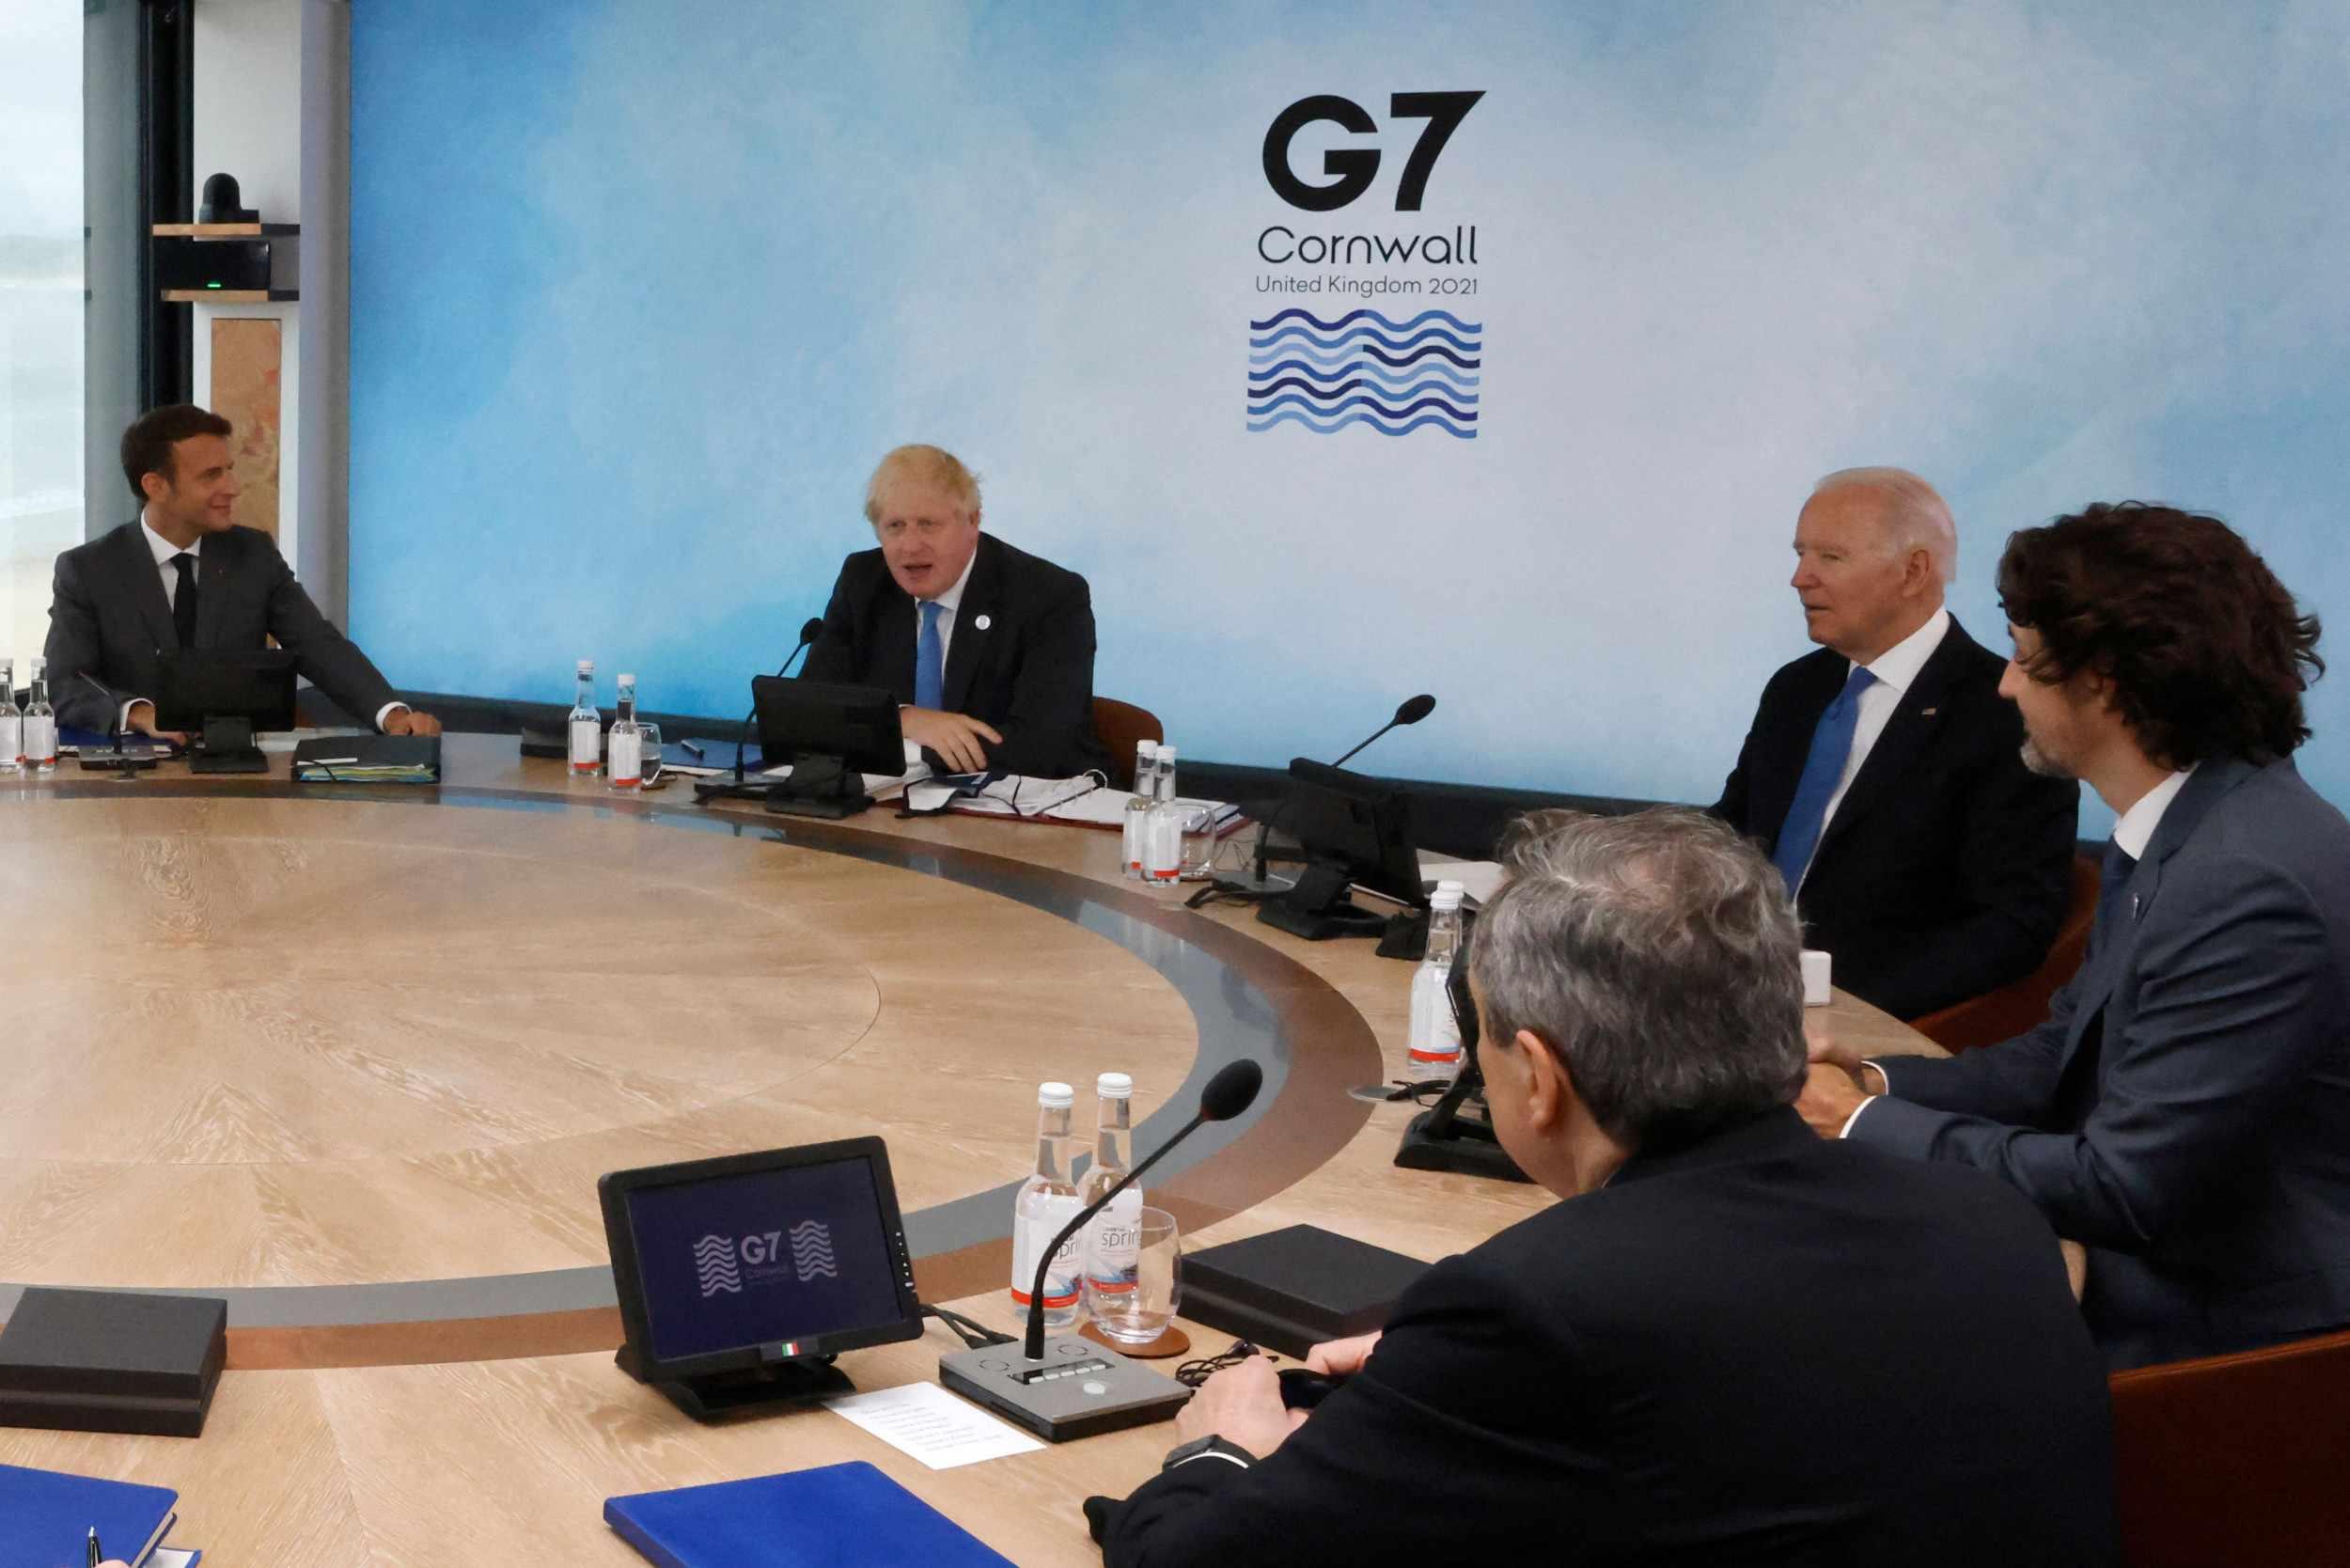 g7 world leaders pandemic prevent